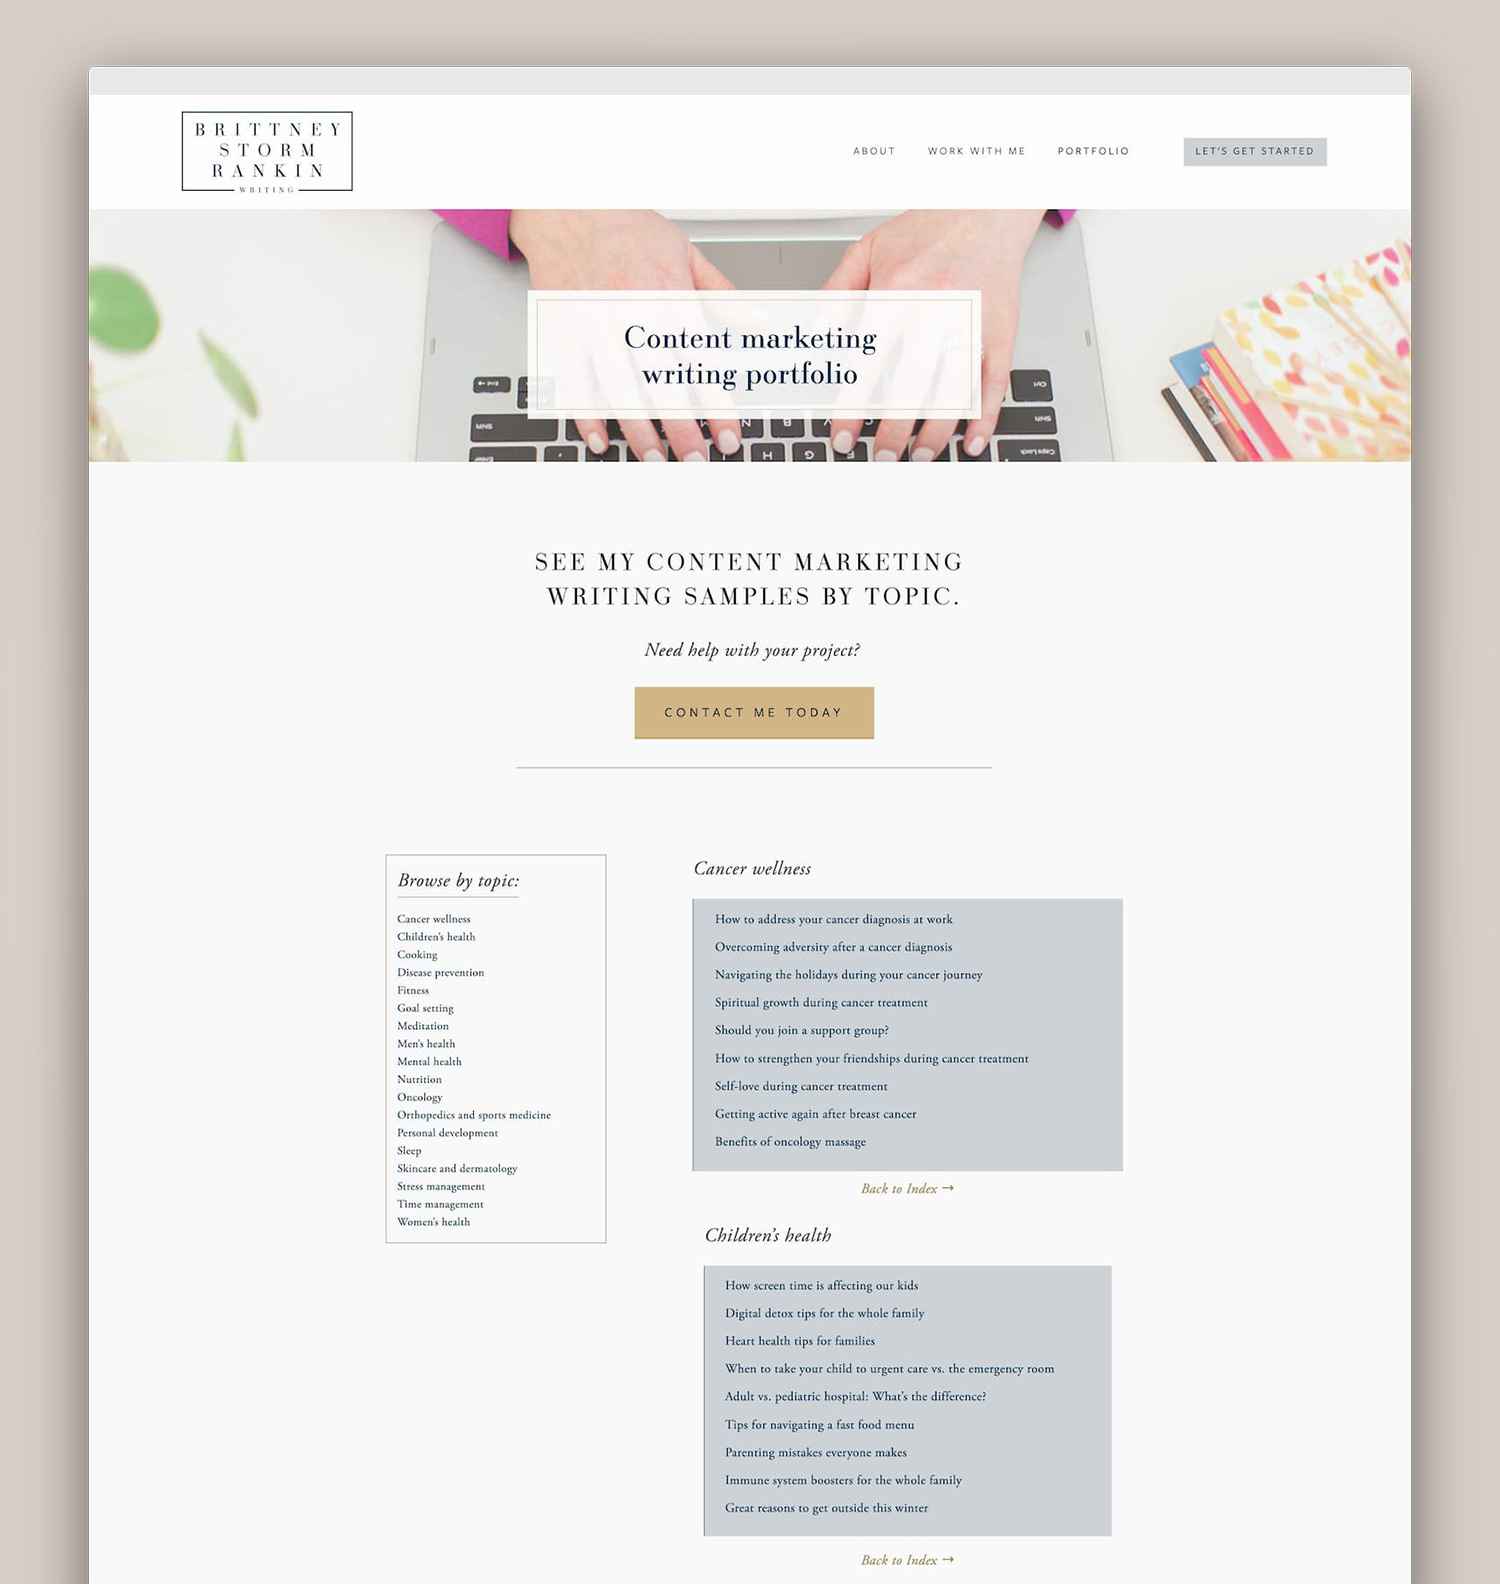 Partial Portfolio page _ Brittney Storm Rankin Writing _ webdesign by Jodi Neufeld Design.jpg